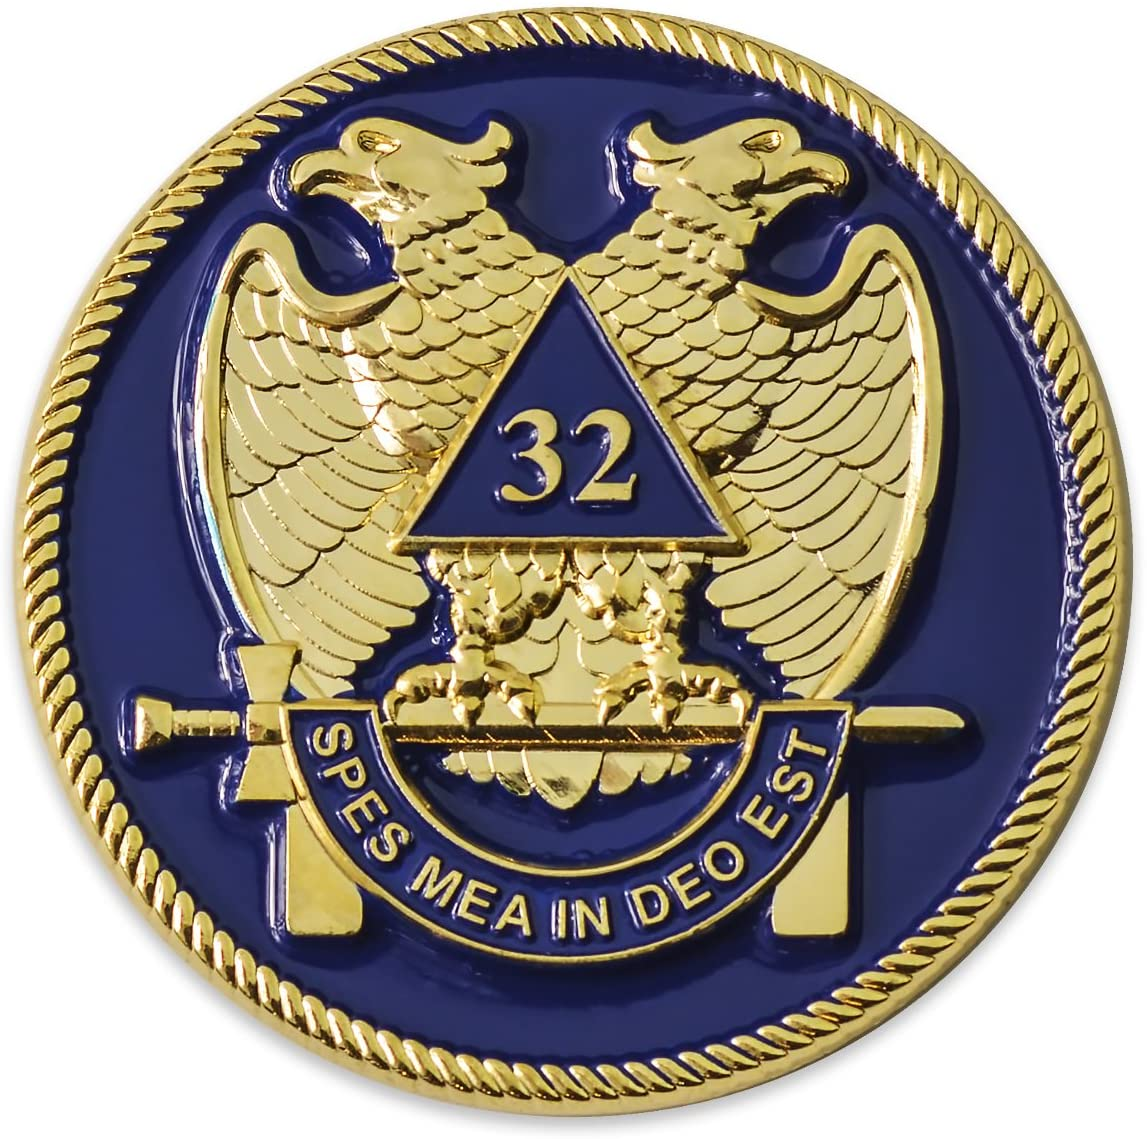 32nd Degree Scottish Rite Masonic Auto Emblem - [Blue & Gold][2'' Diameter]